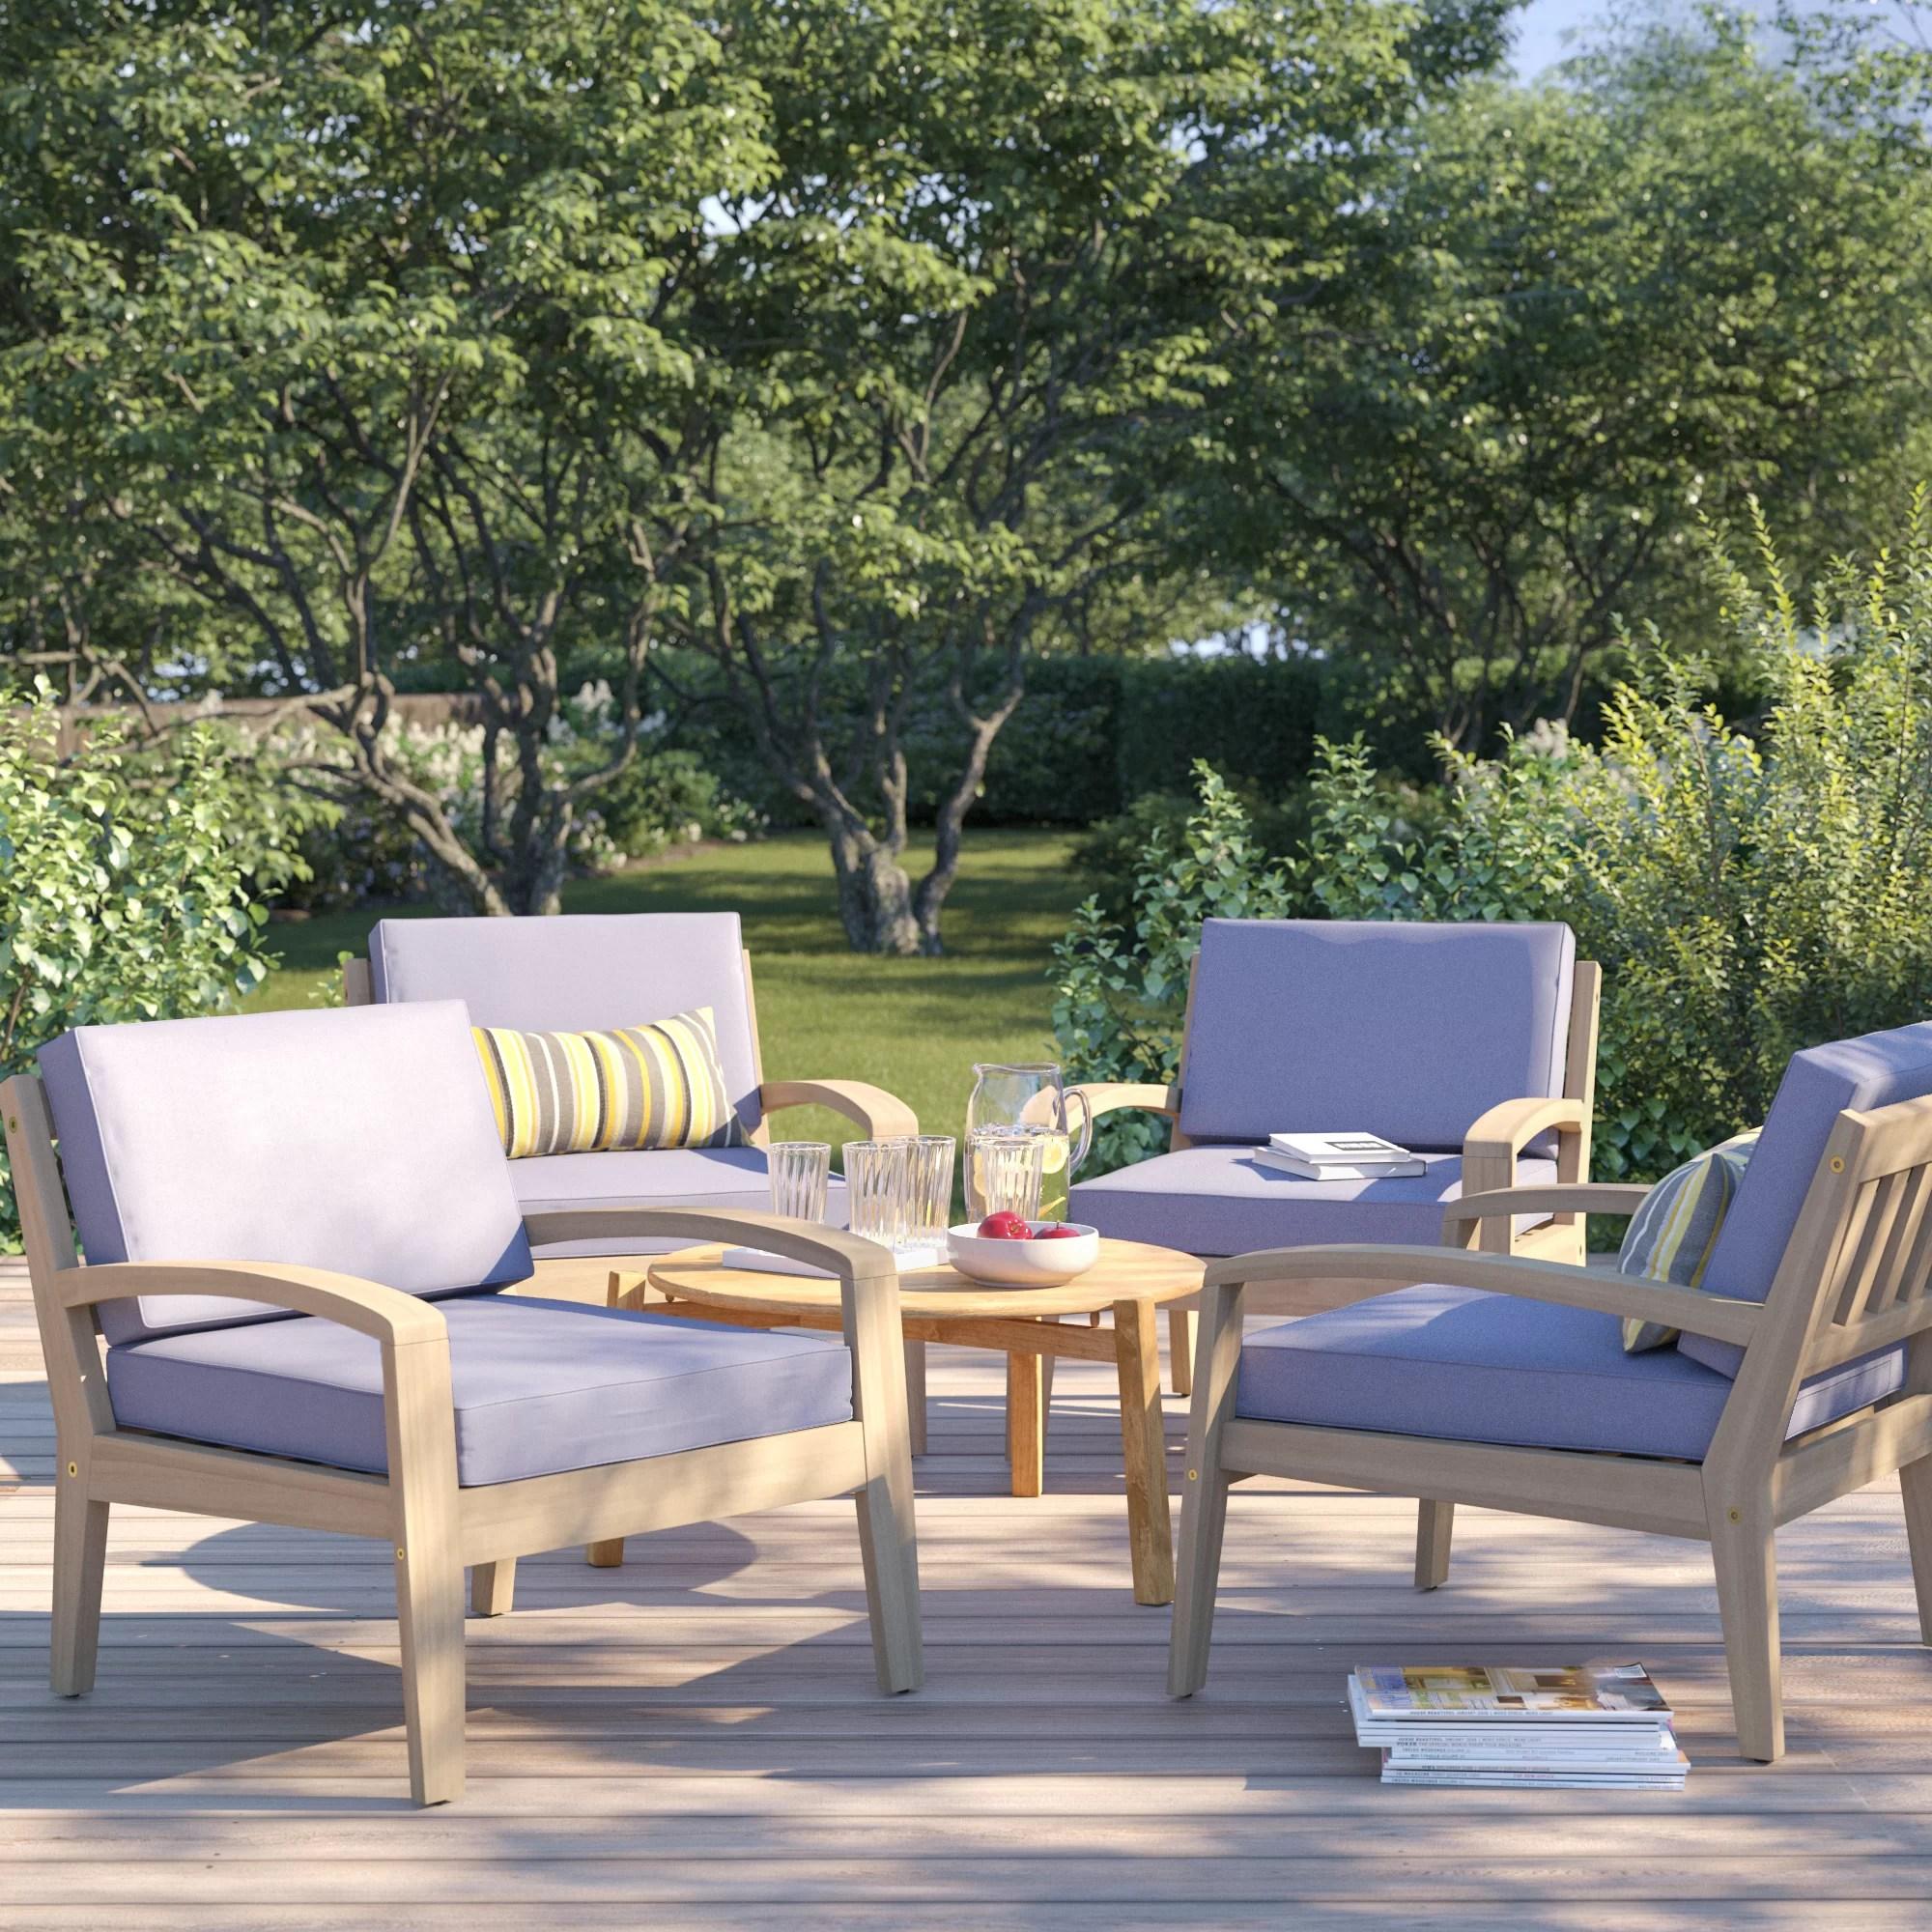 berkley wood frame patio chair with cushions